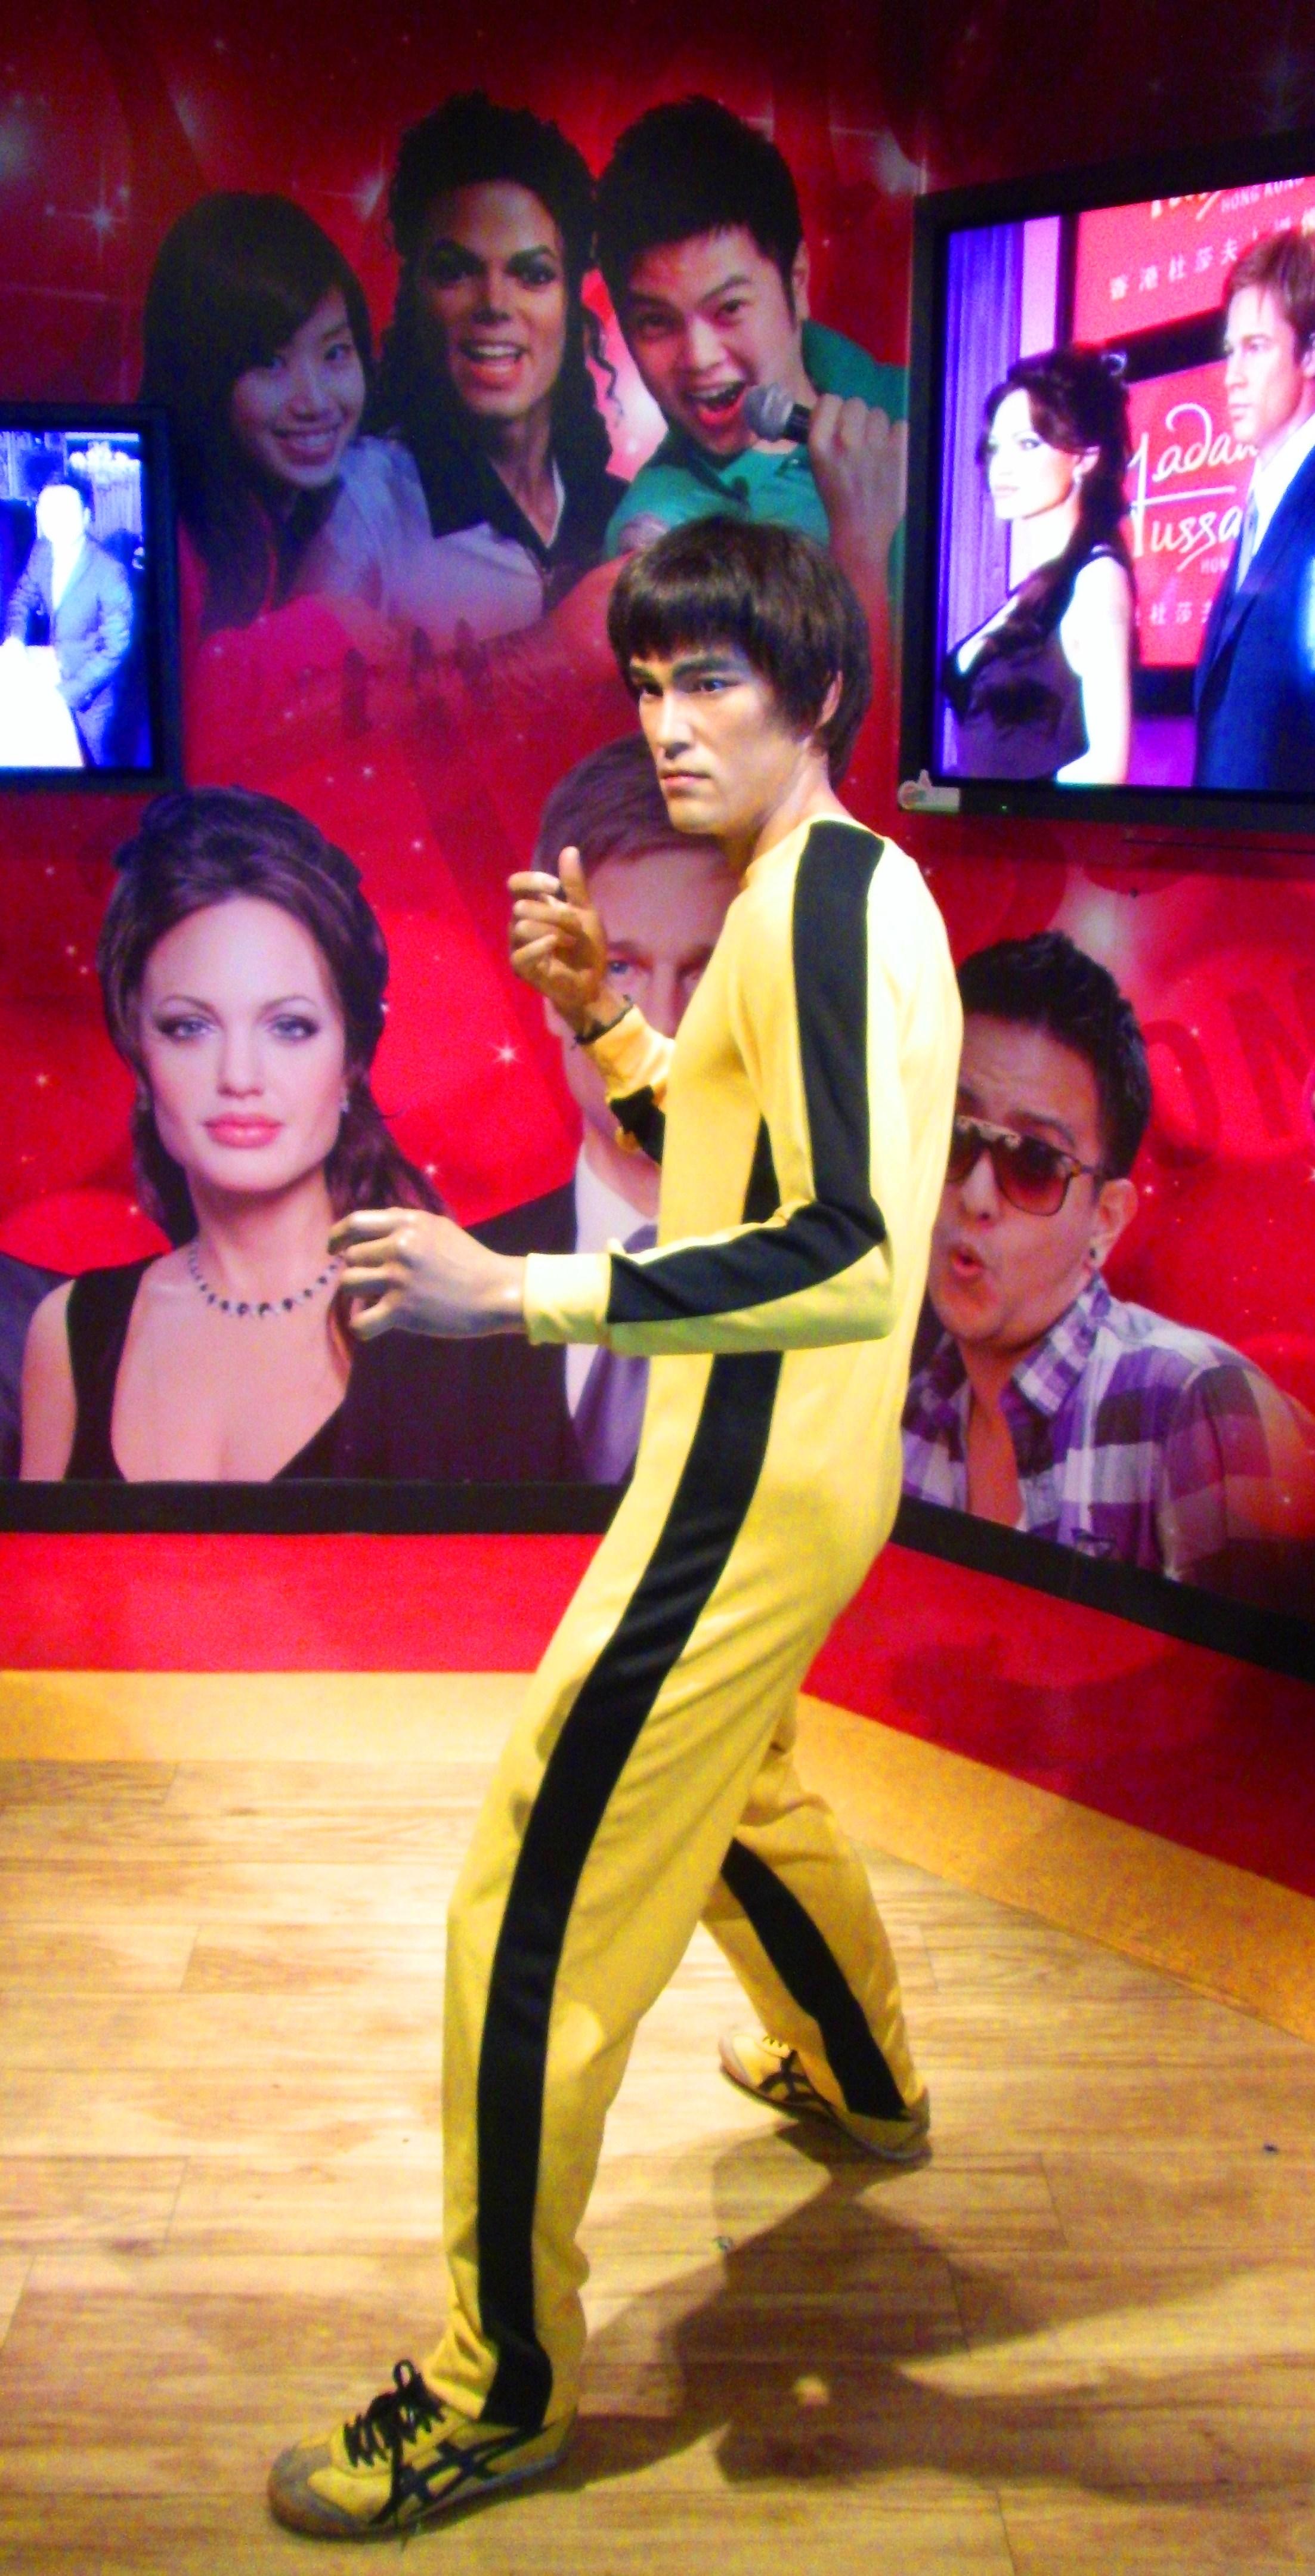 Bruce Li wax figure at Madame Tussauds